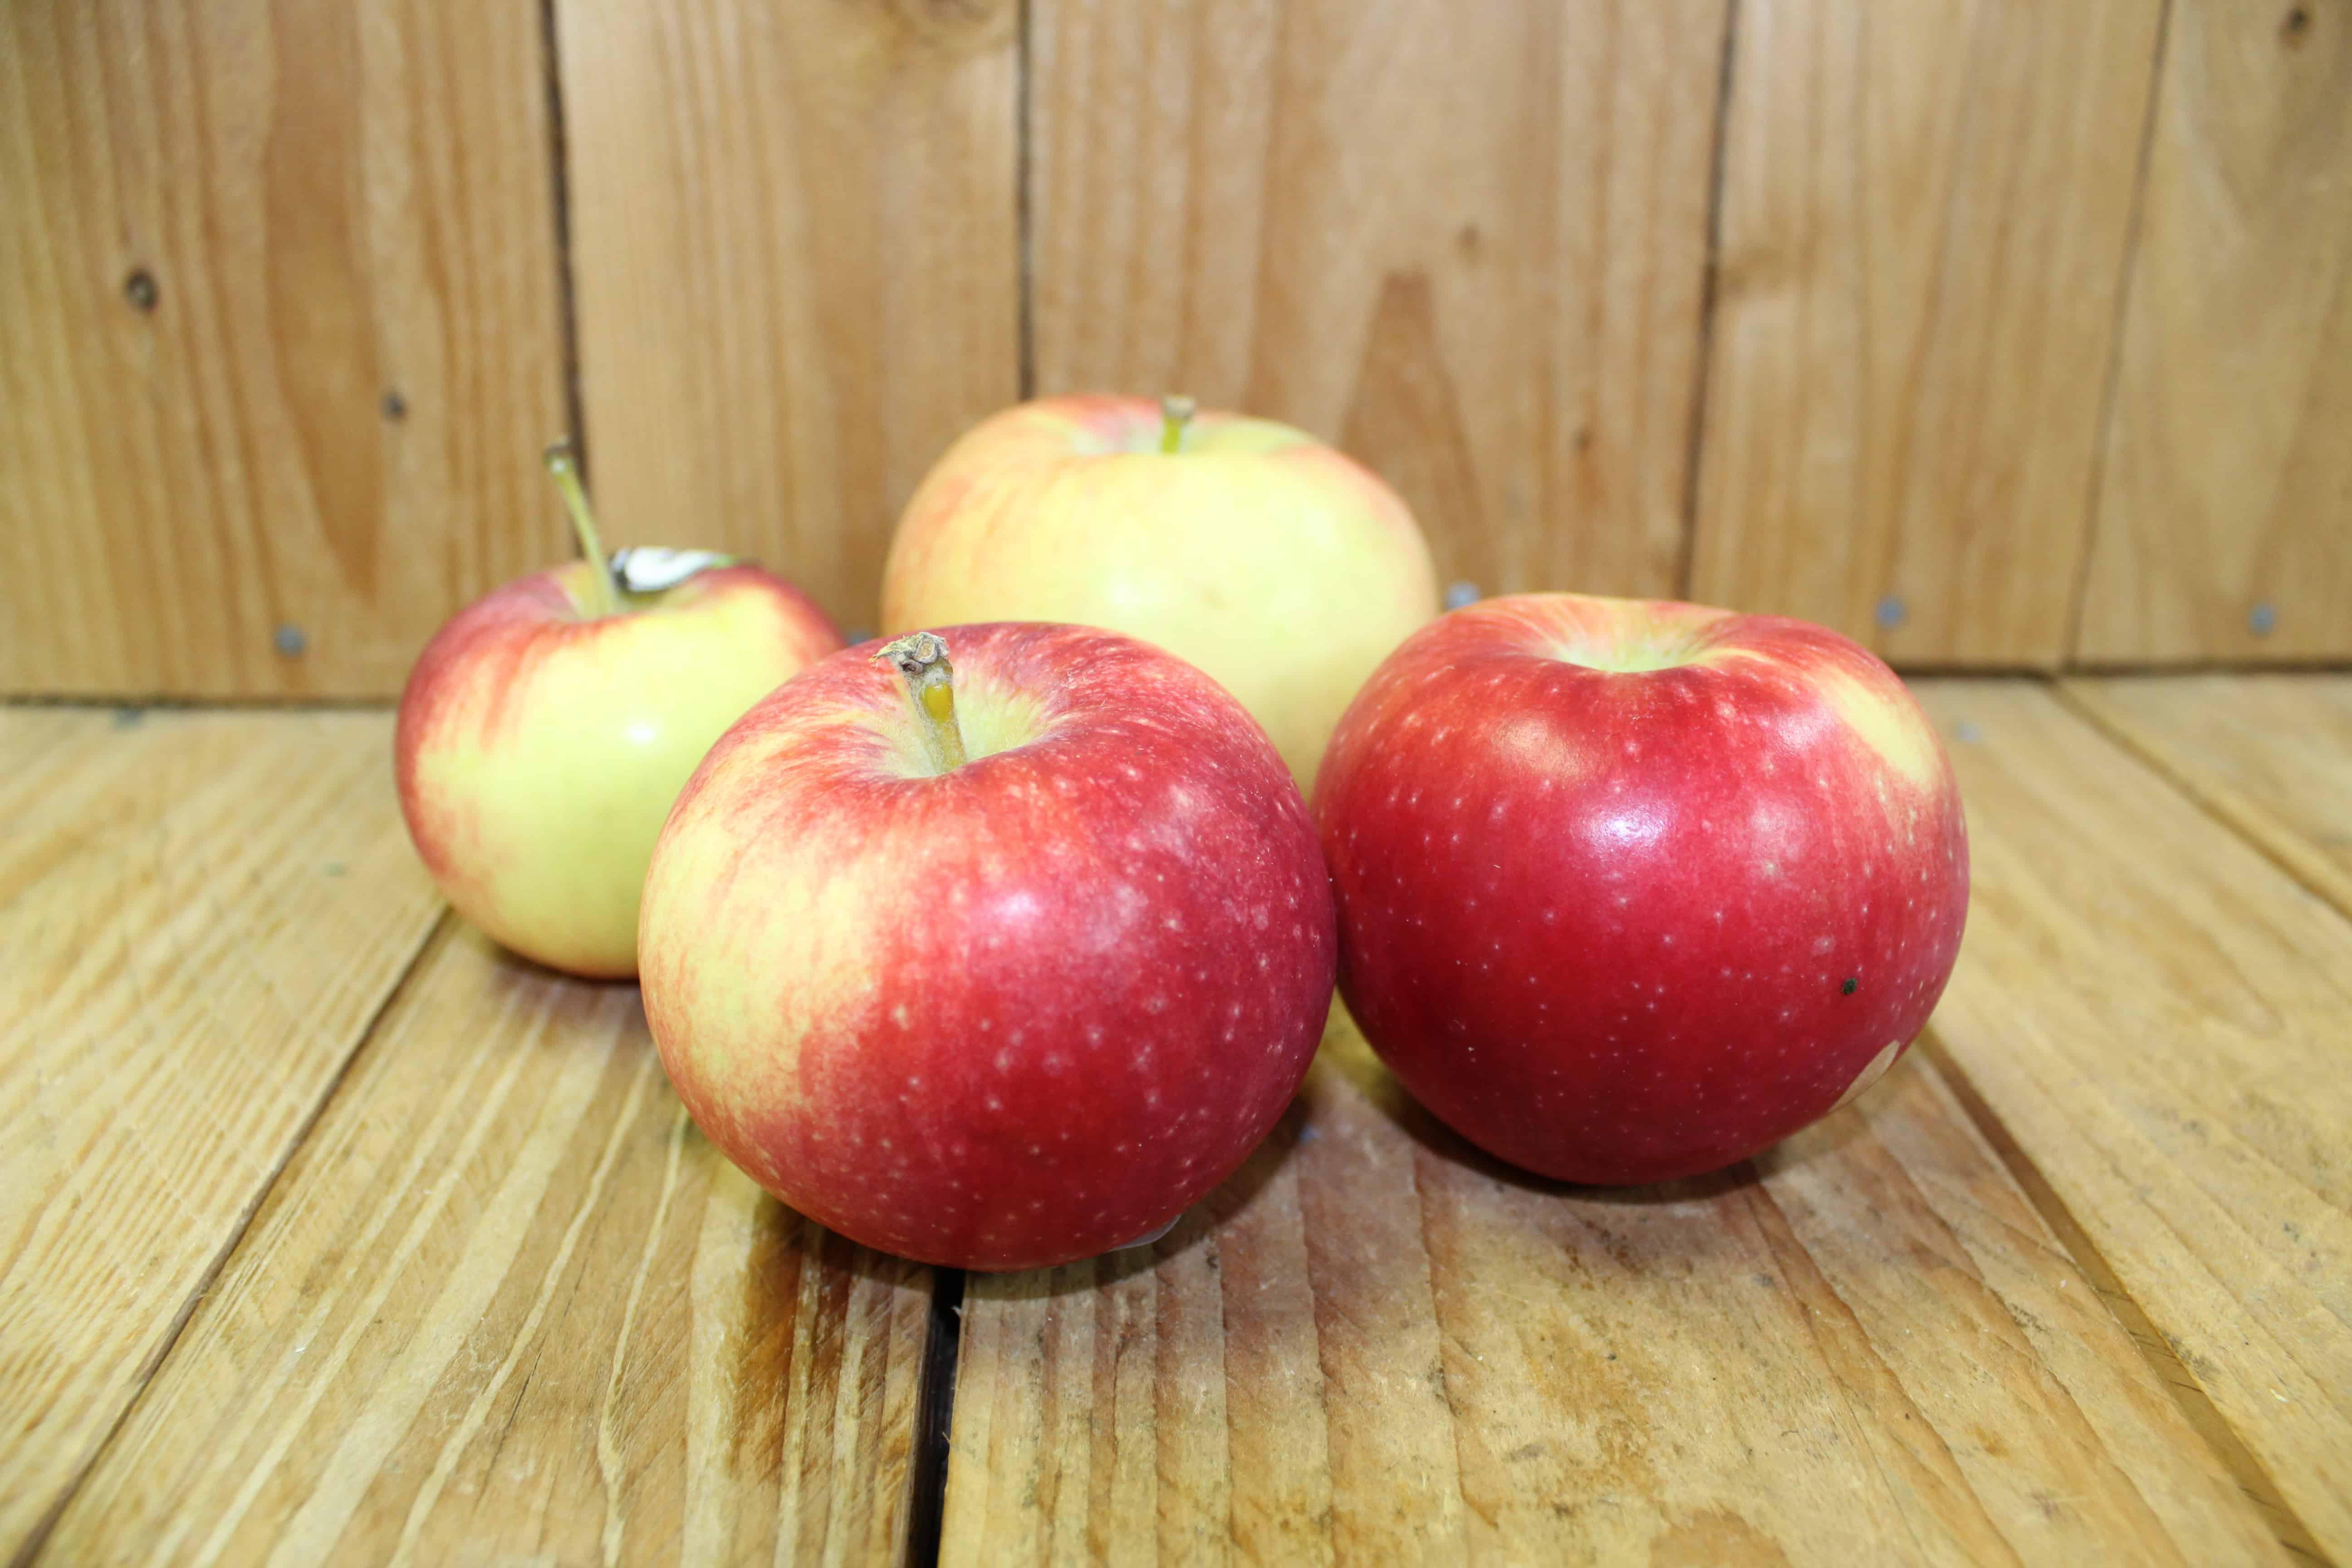 Apples – Lobo QUEBEC Verger Maia (2LB Bag)